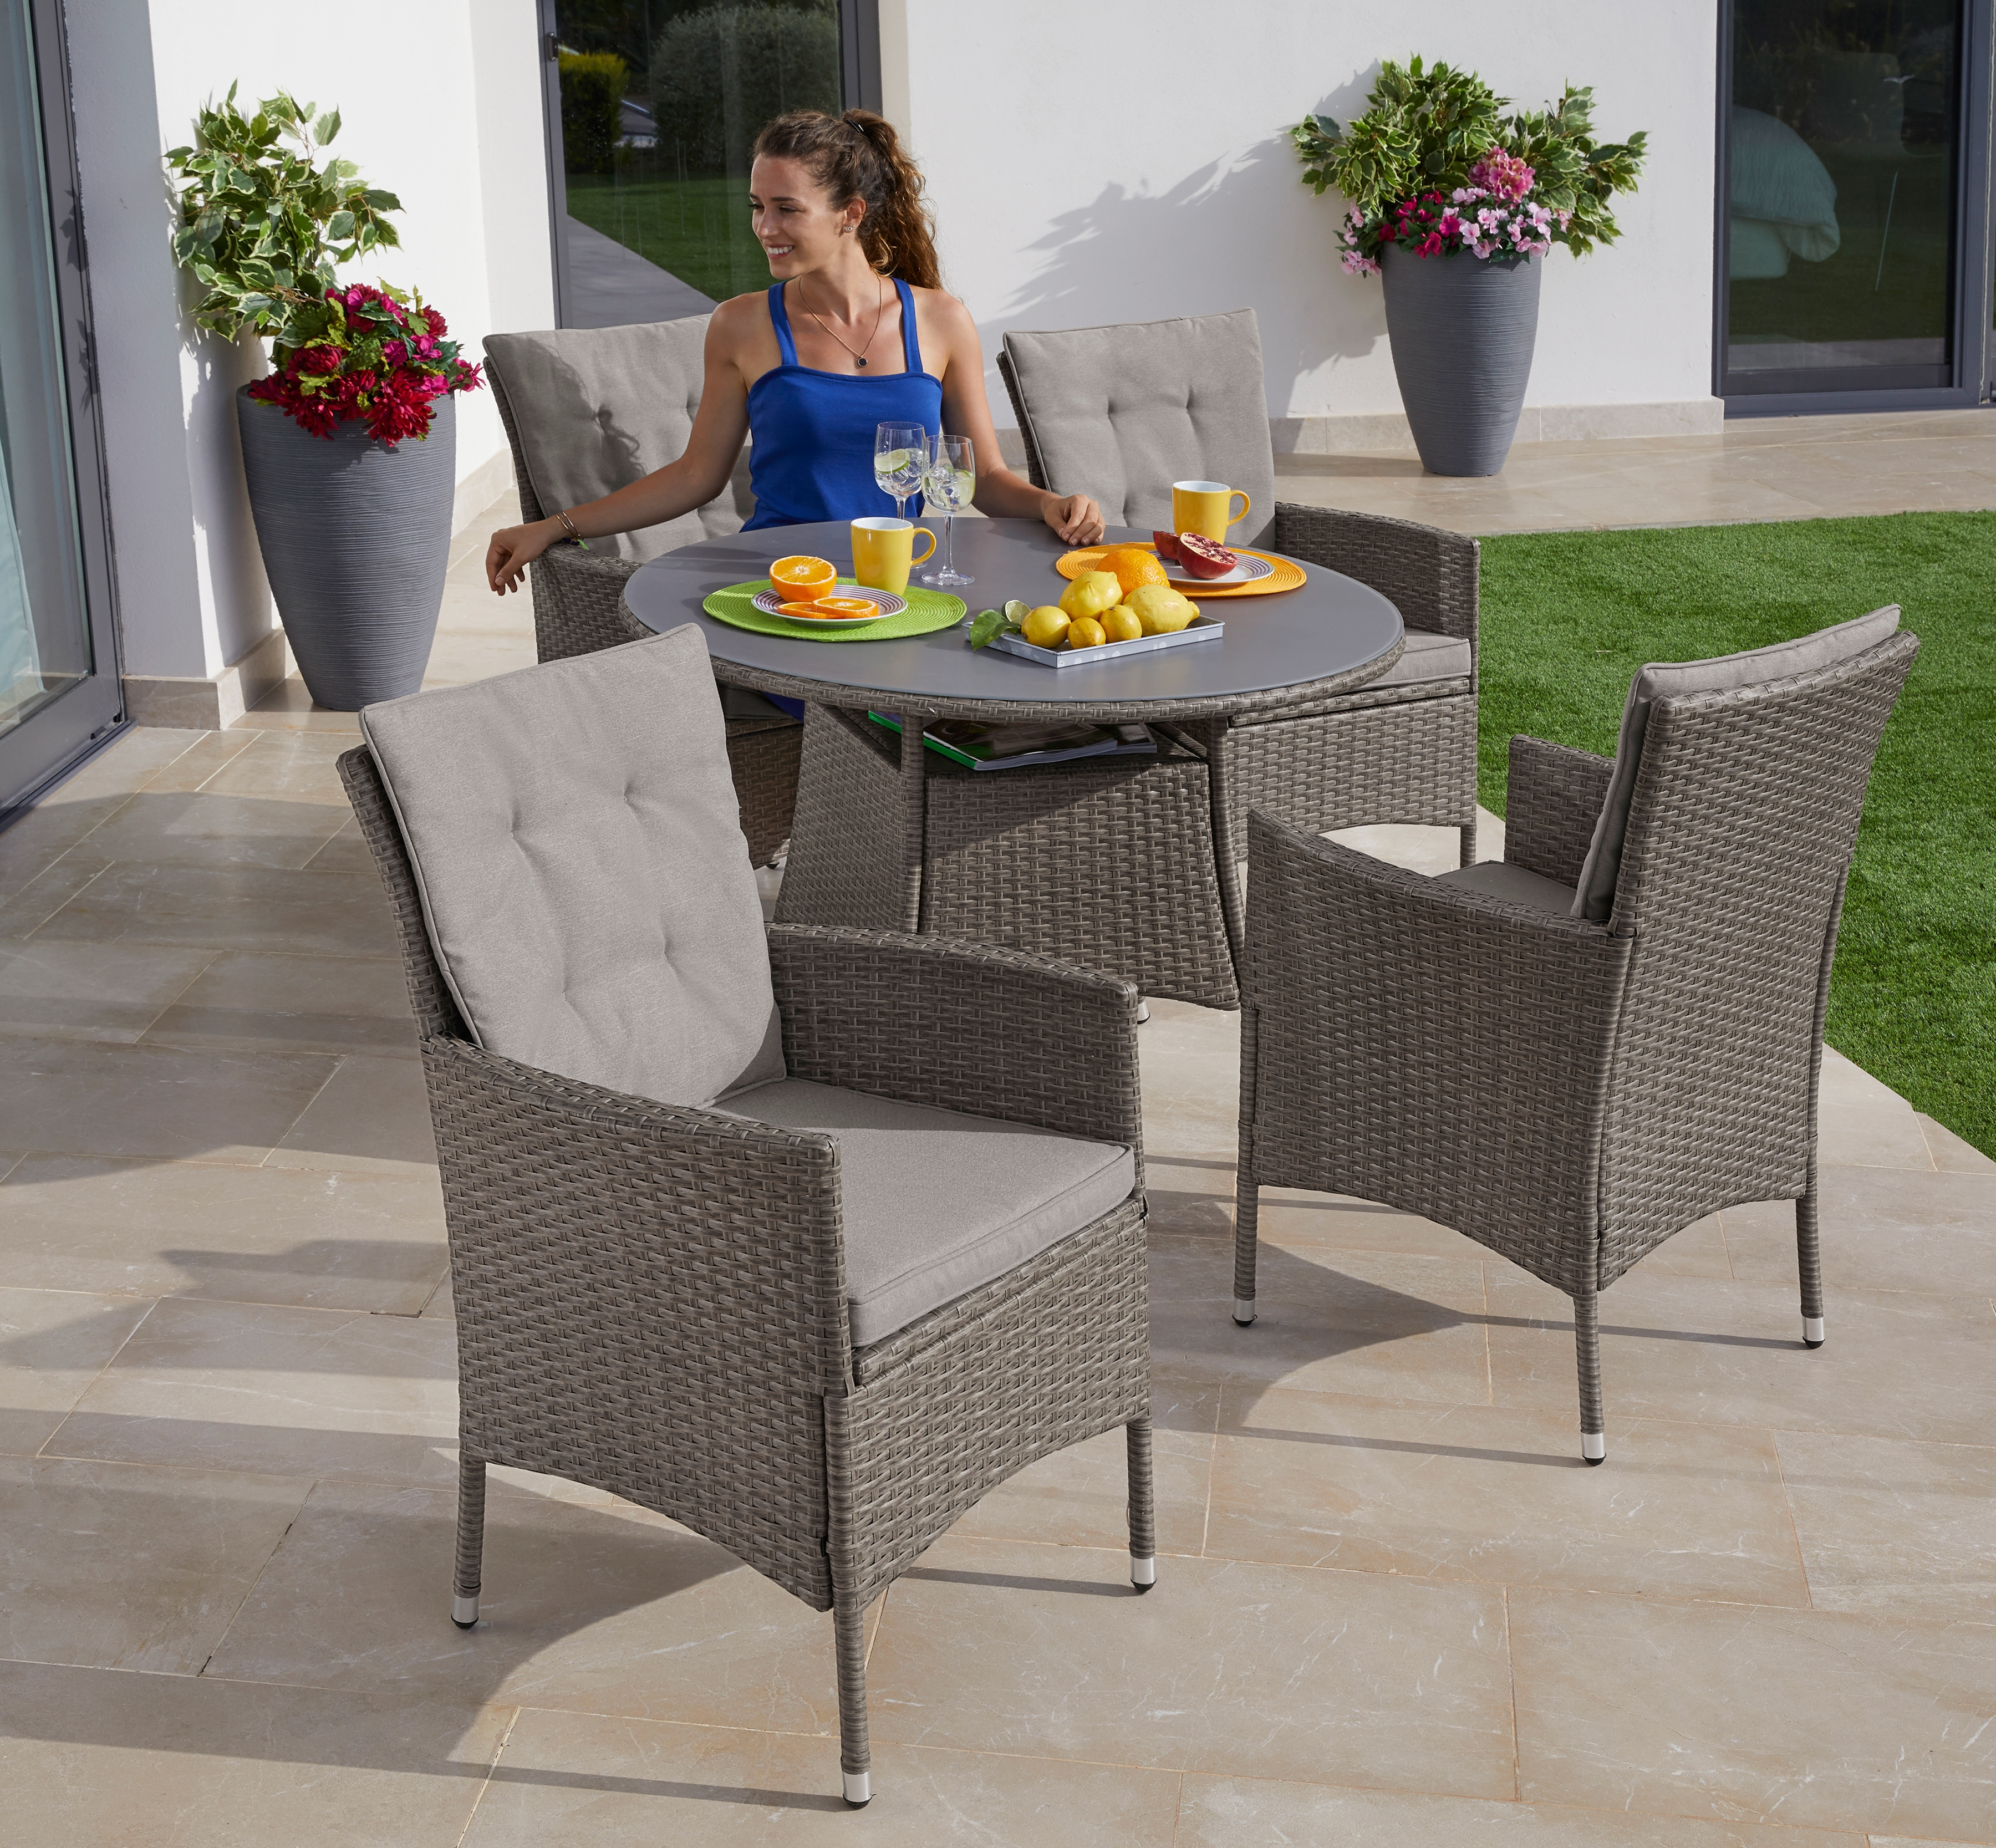 KONIFERA Gartenmöbelset Mailand 13-tlg 4 Sessel Tisch Ø 100 cm Polyrattan